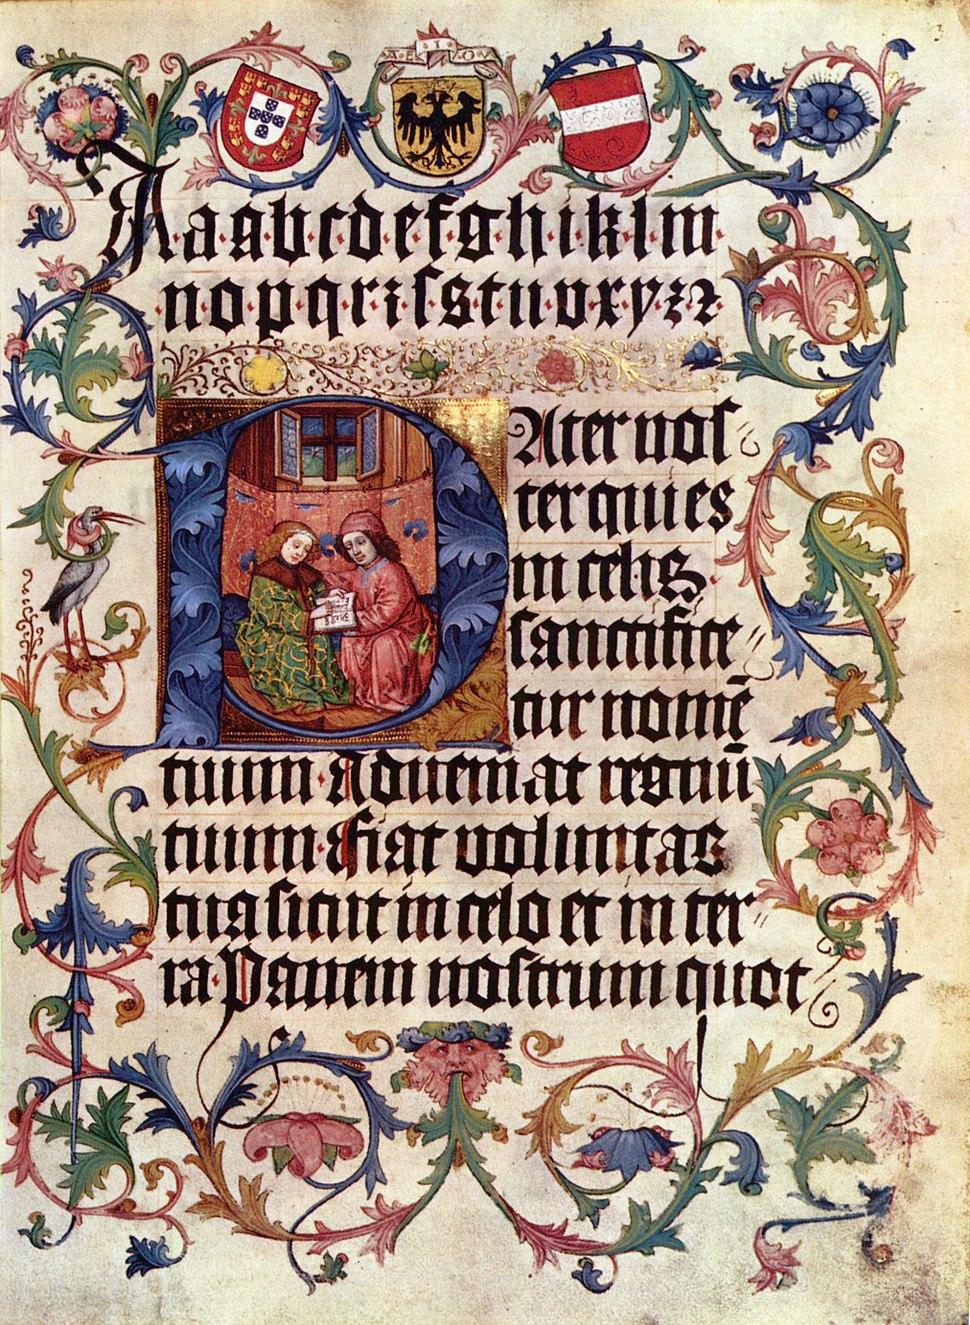 Meister des Lehrbuchs Kaiser Maximilians I. 001